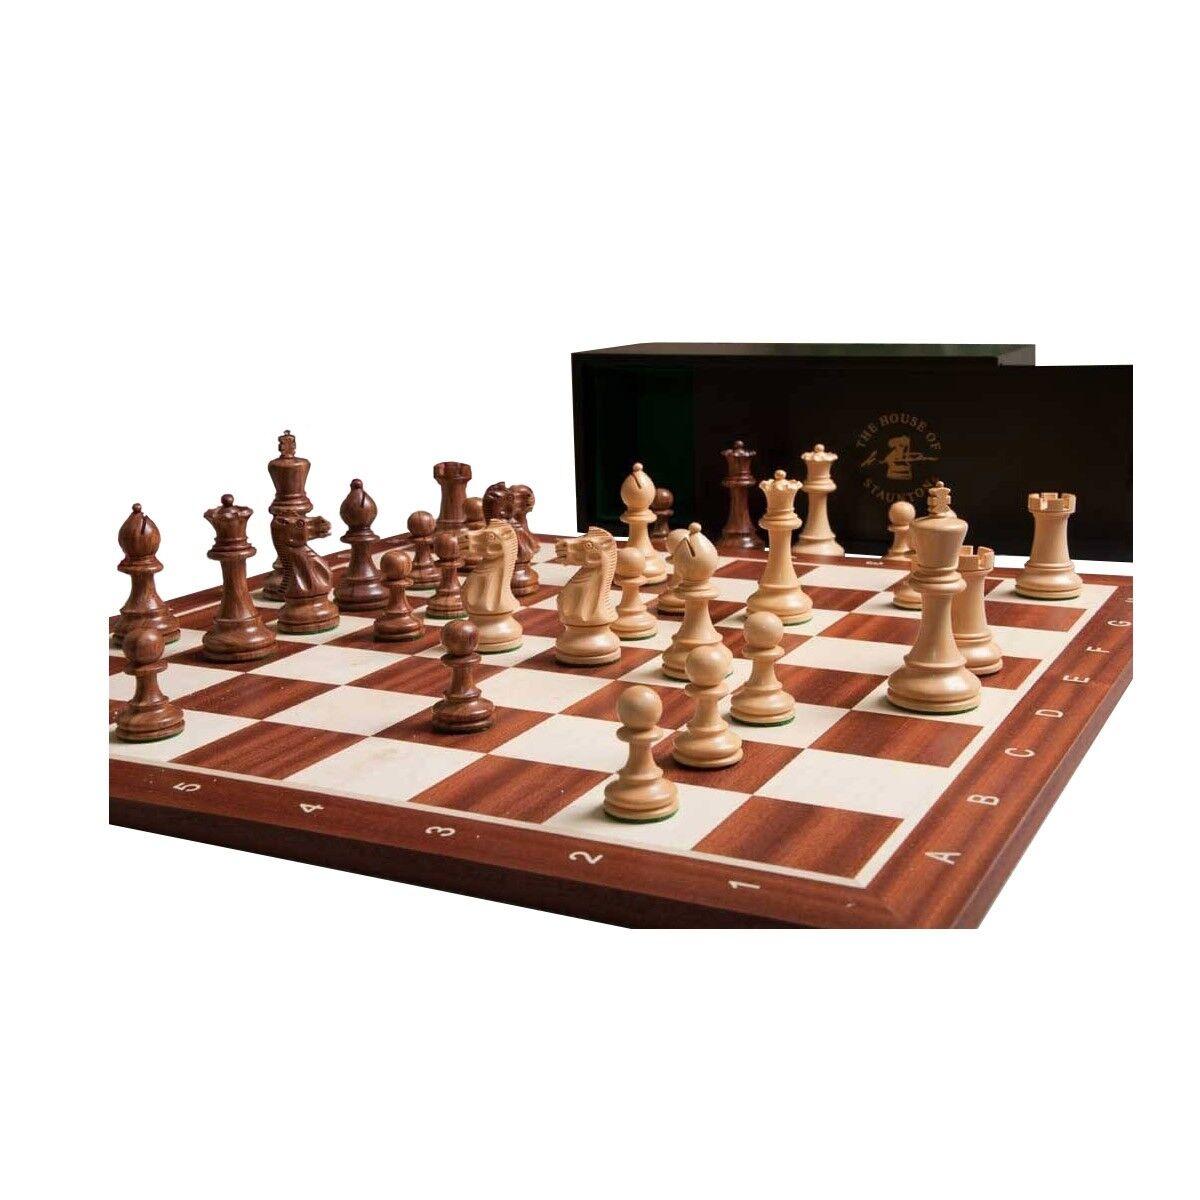 The Grandmaster Chess set, Box, & Board Combination - oroen rosawood and Natura